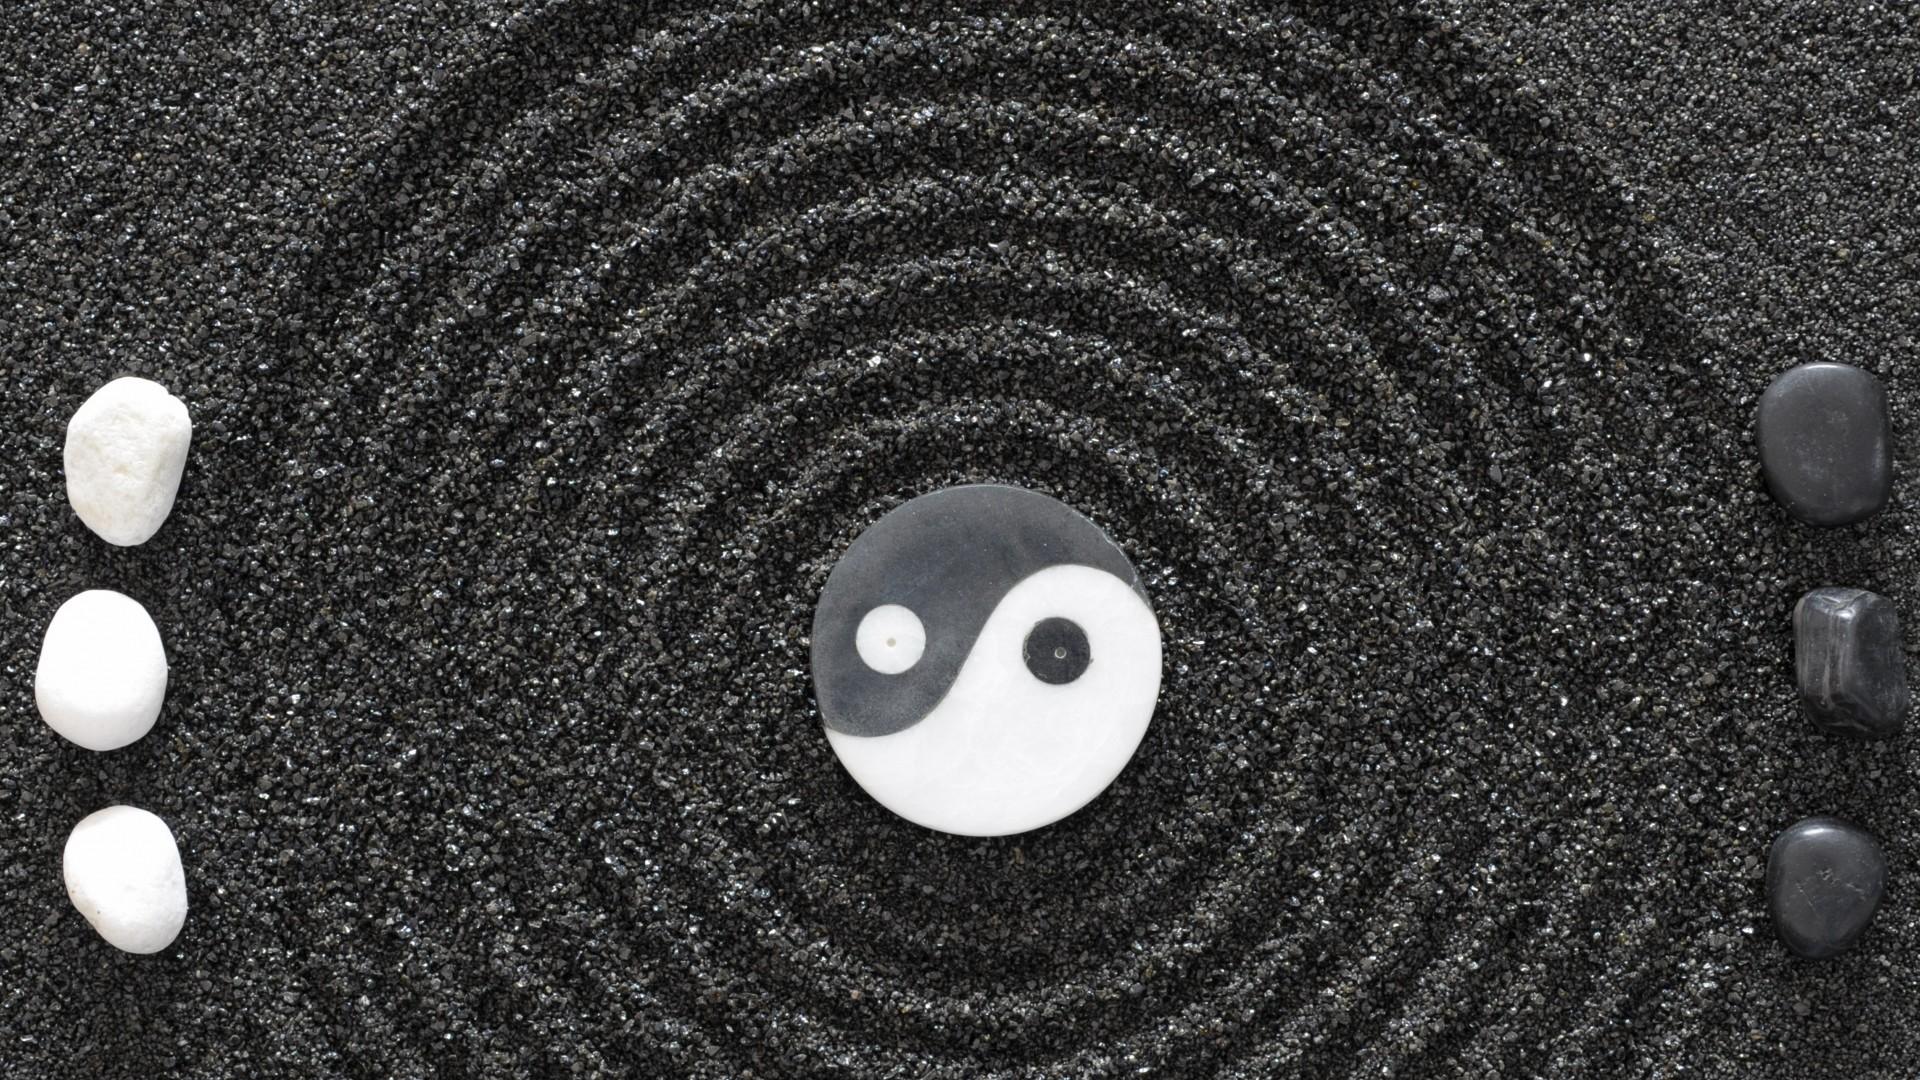 Cool Yin Yang Wallpaper (61+ images)